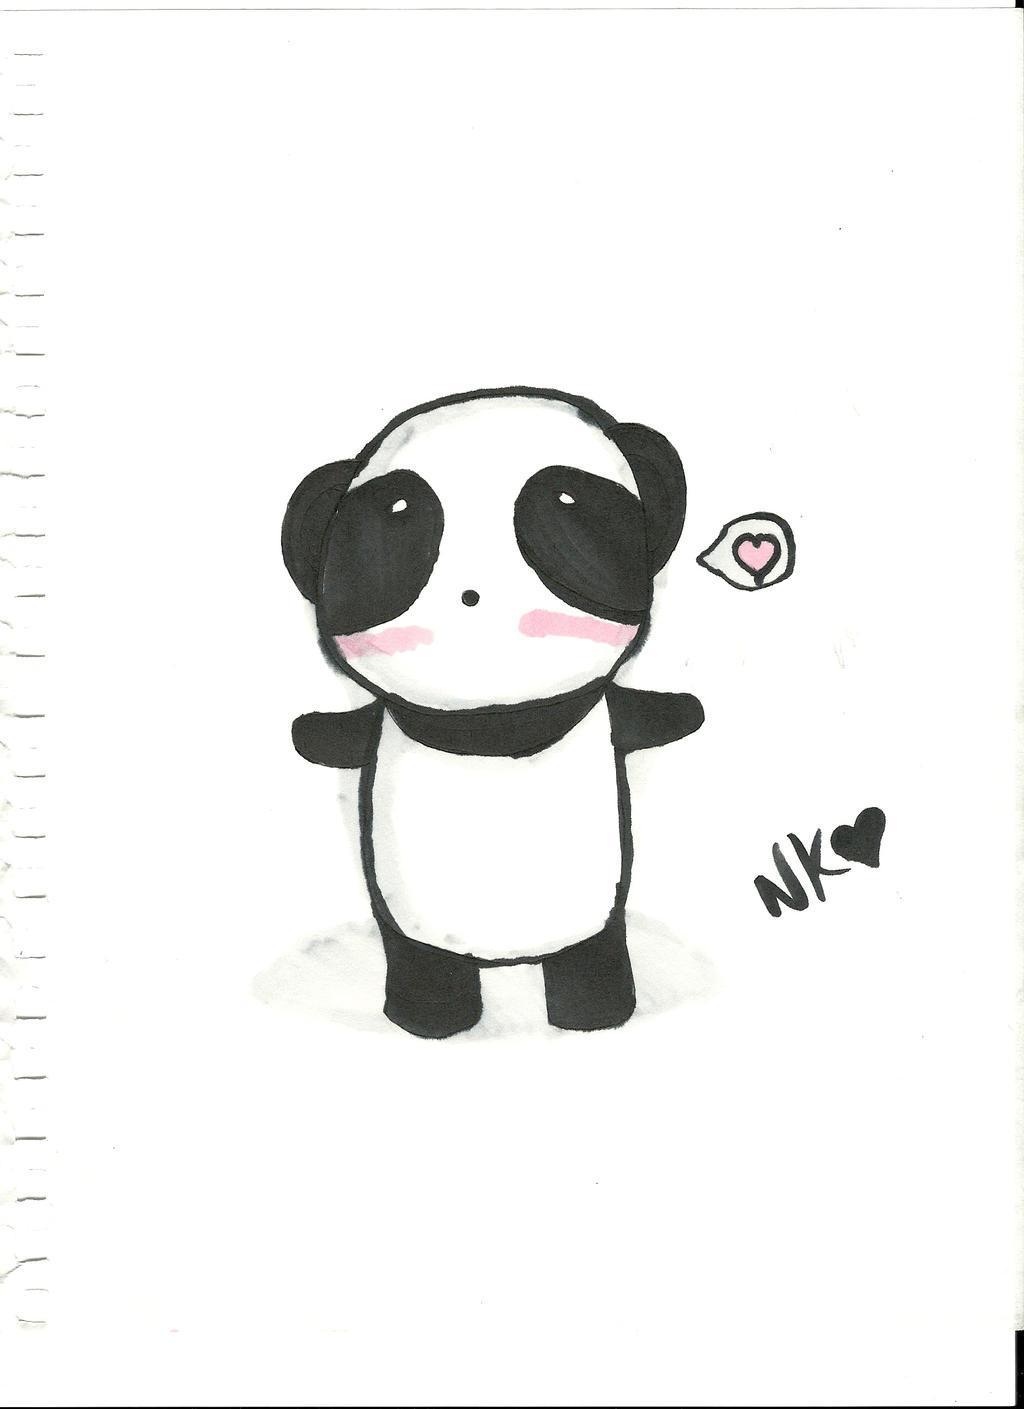 Panda Drawing On Paper With Copics by nekokitty54321Drawing Of A Cute Panda